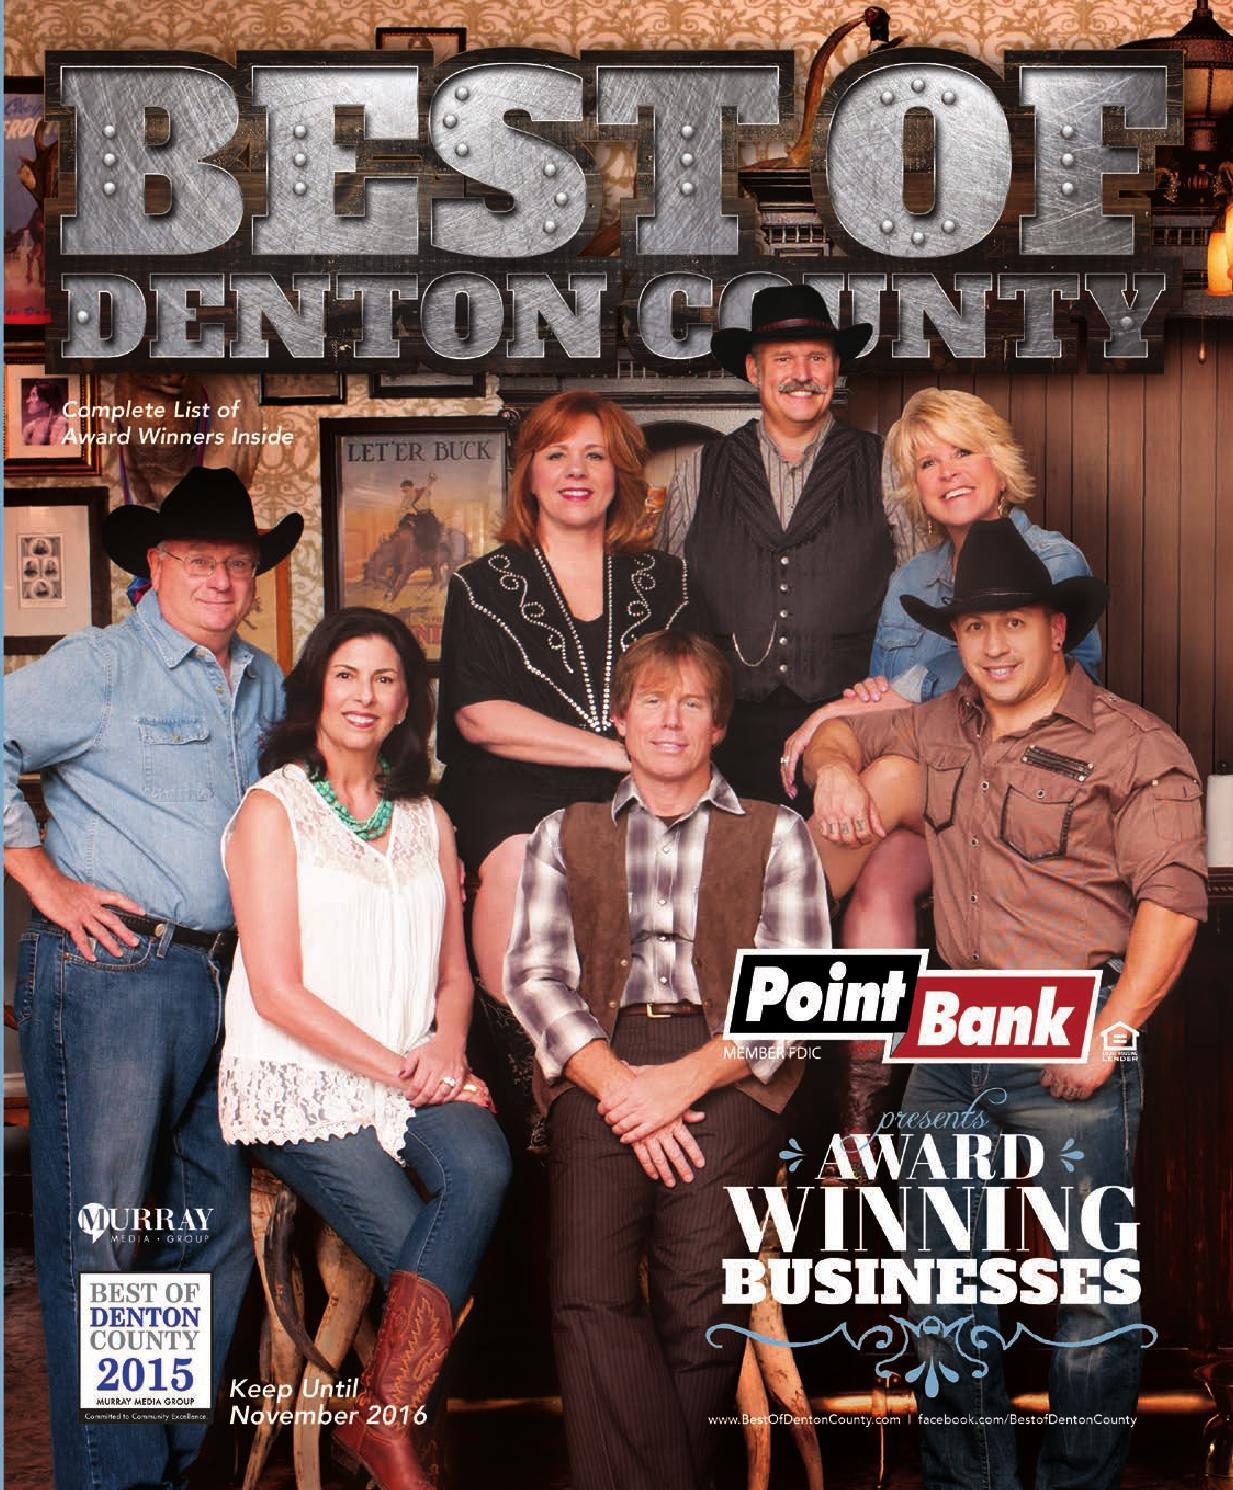 Best of Denton County 2015 by Murray Media Publishing - issuu